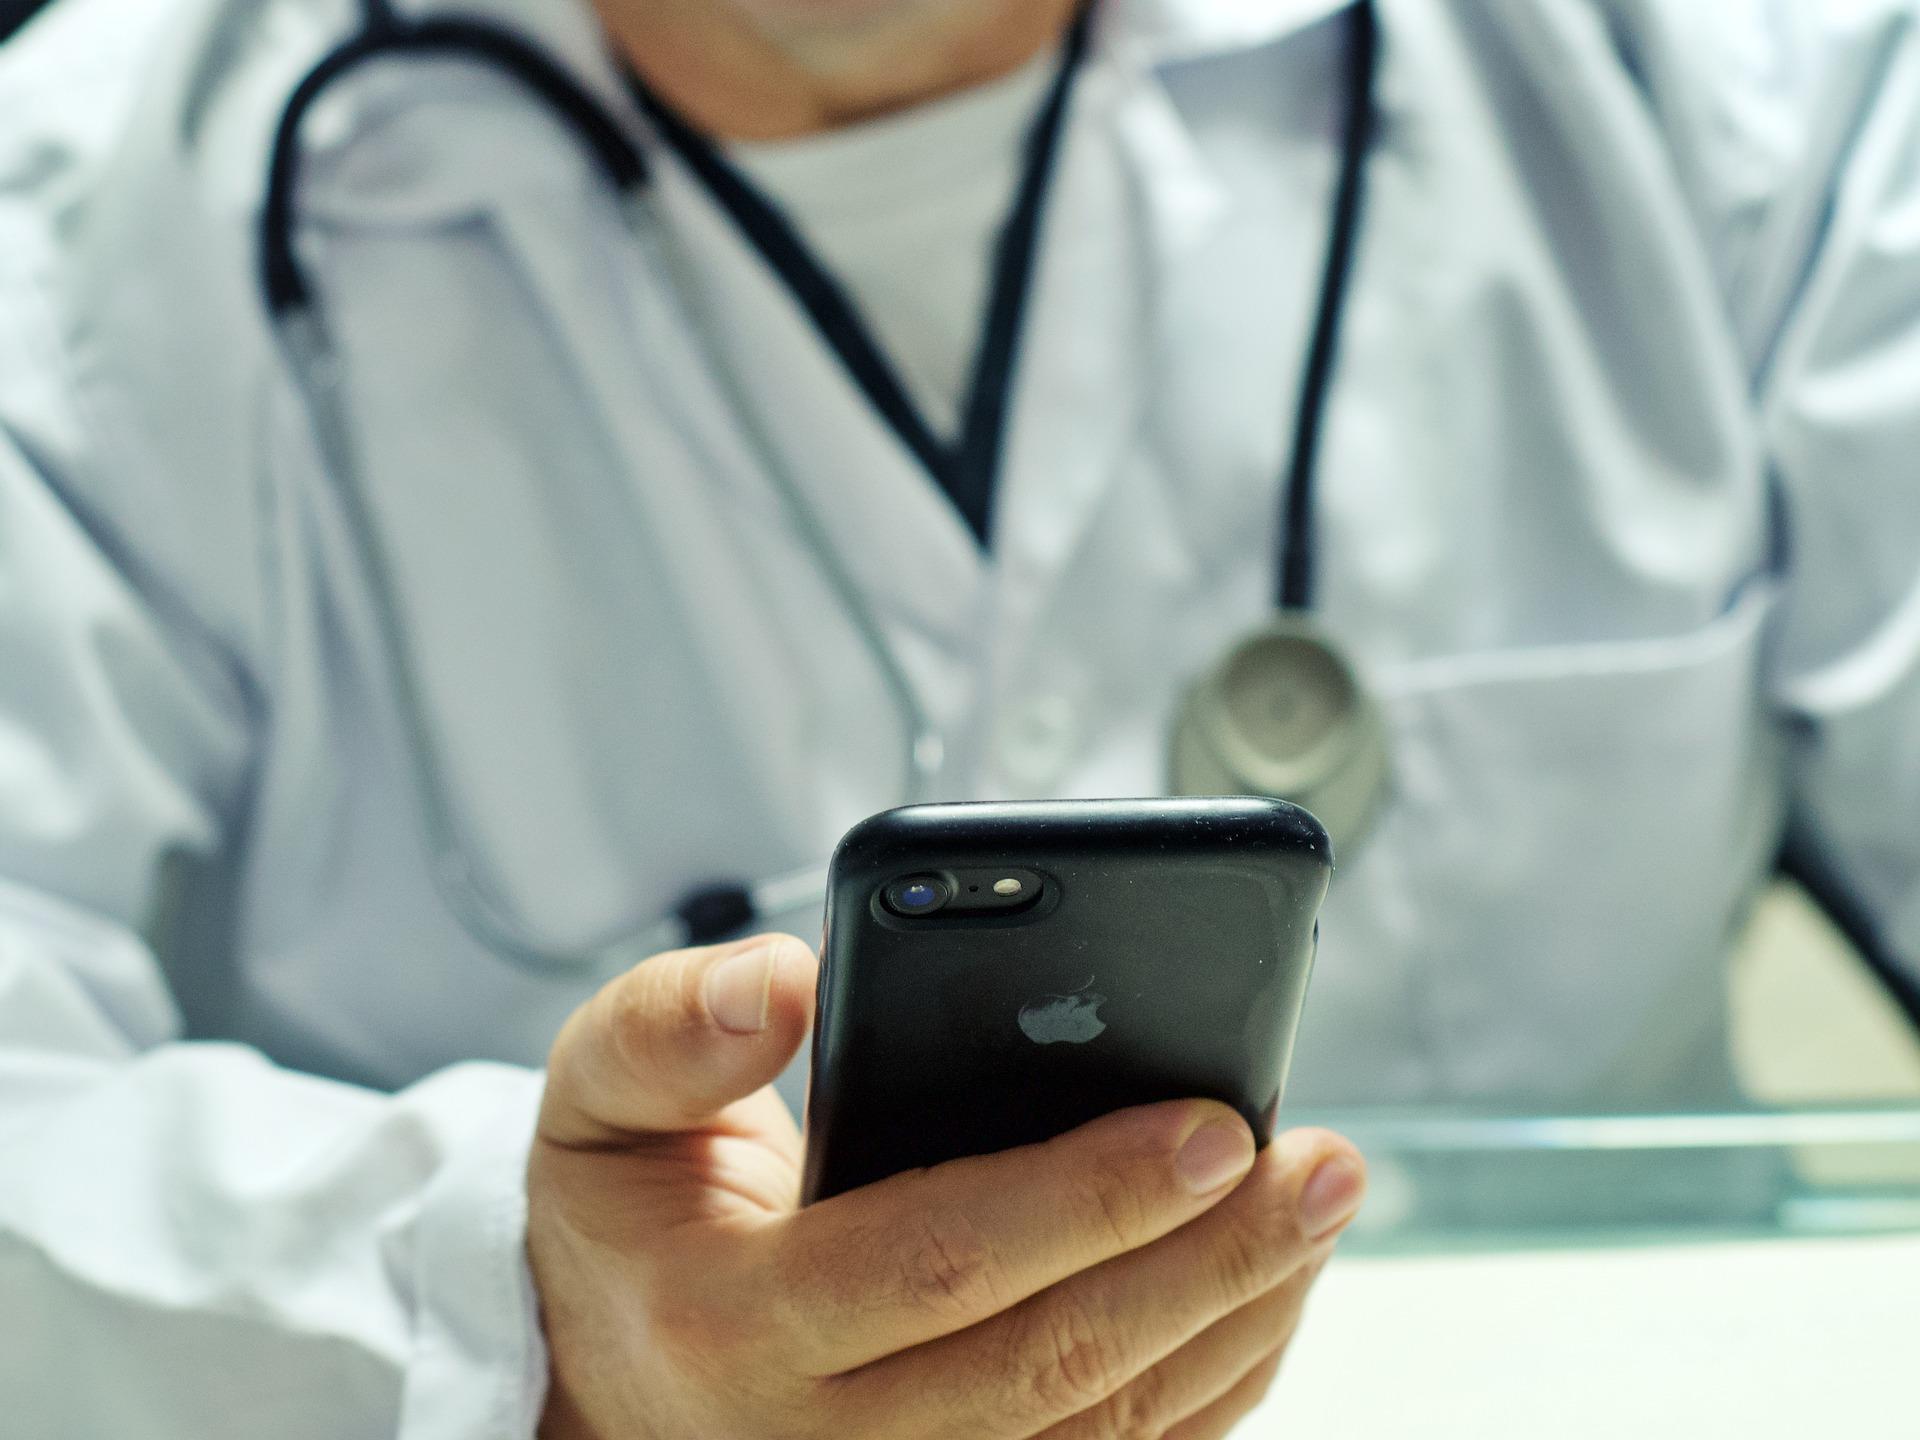 Oncologist calls for medical representatives